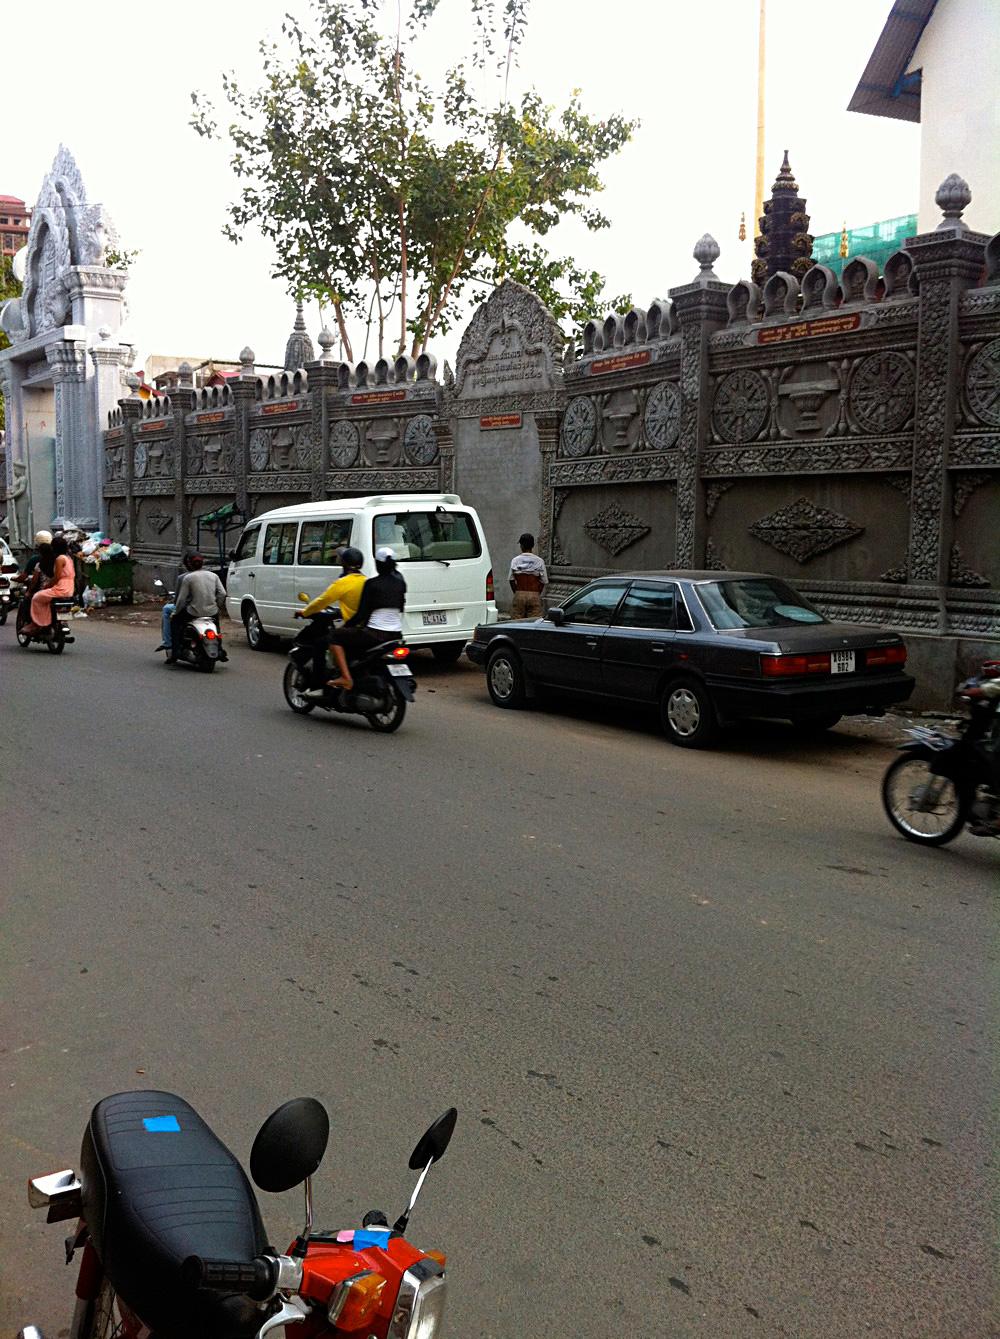 Cambodian Moments Public Urination